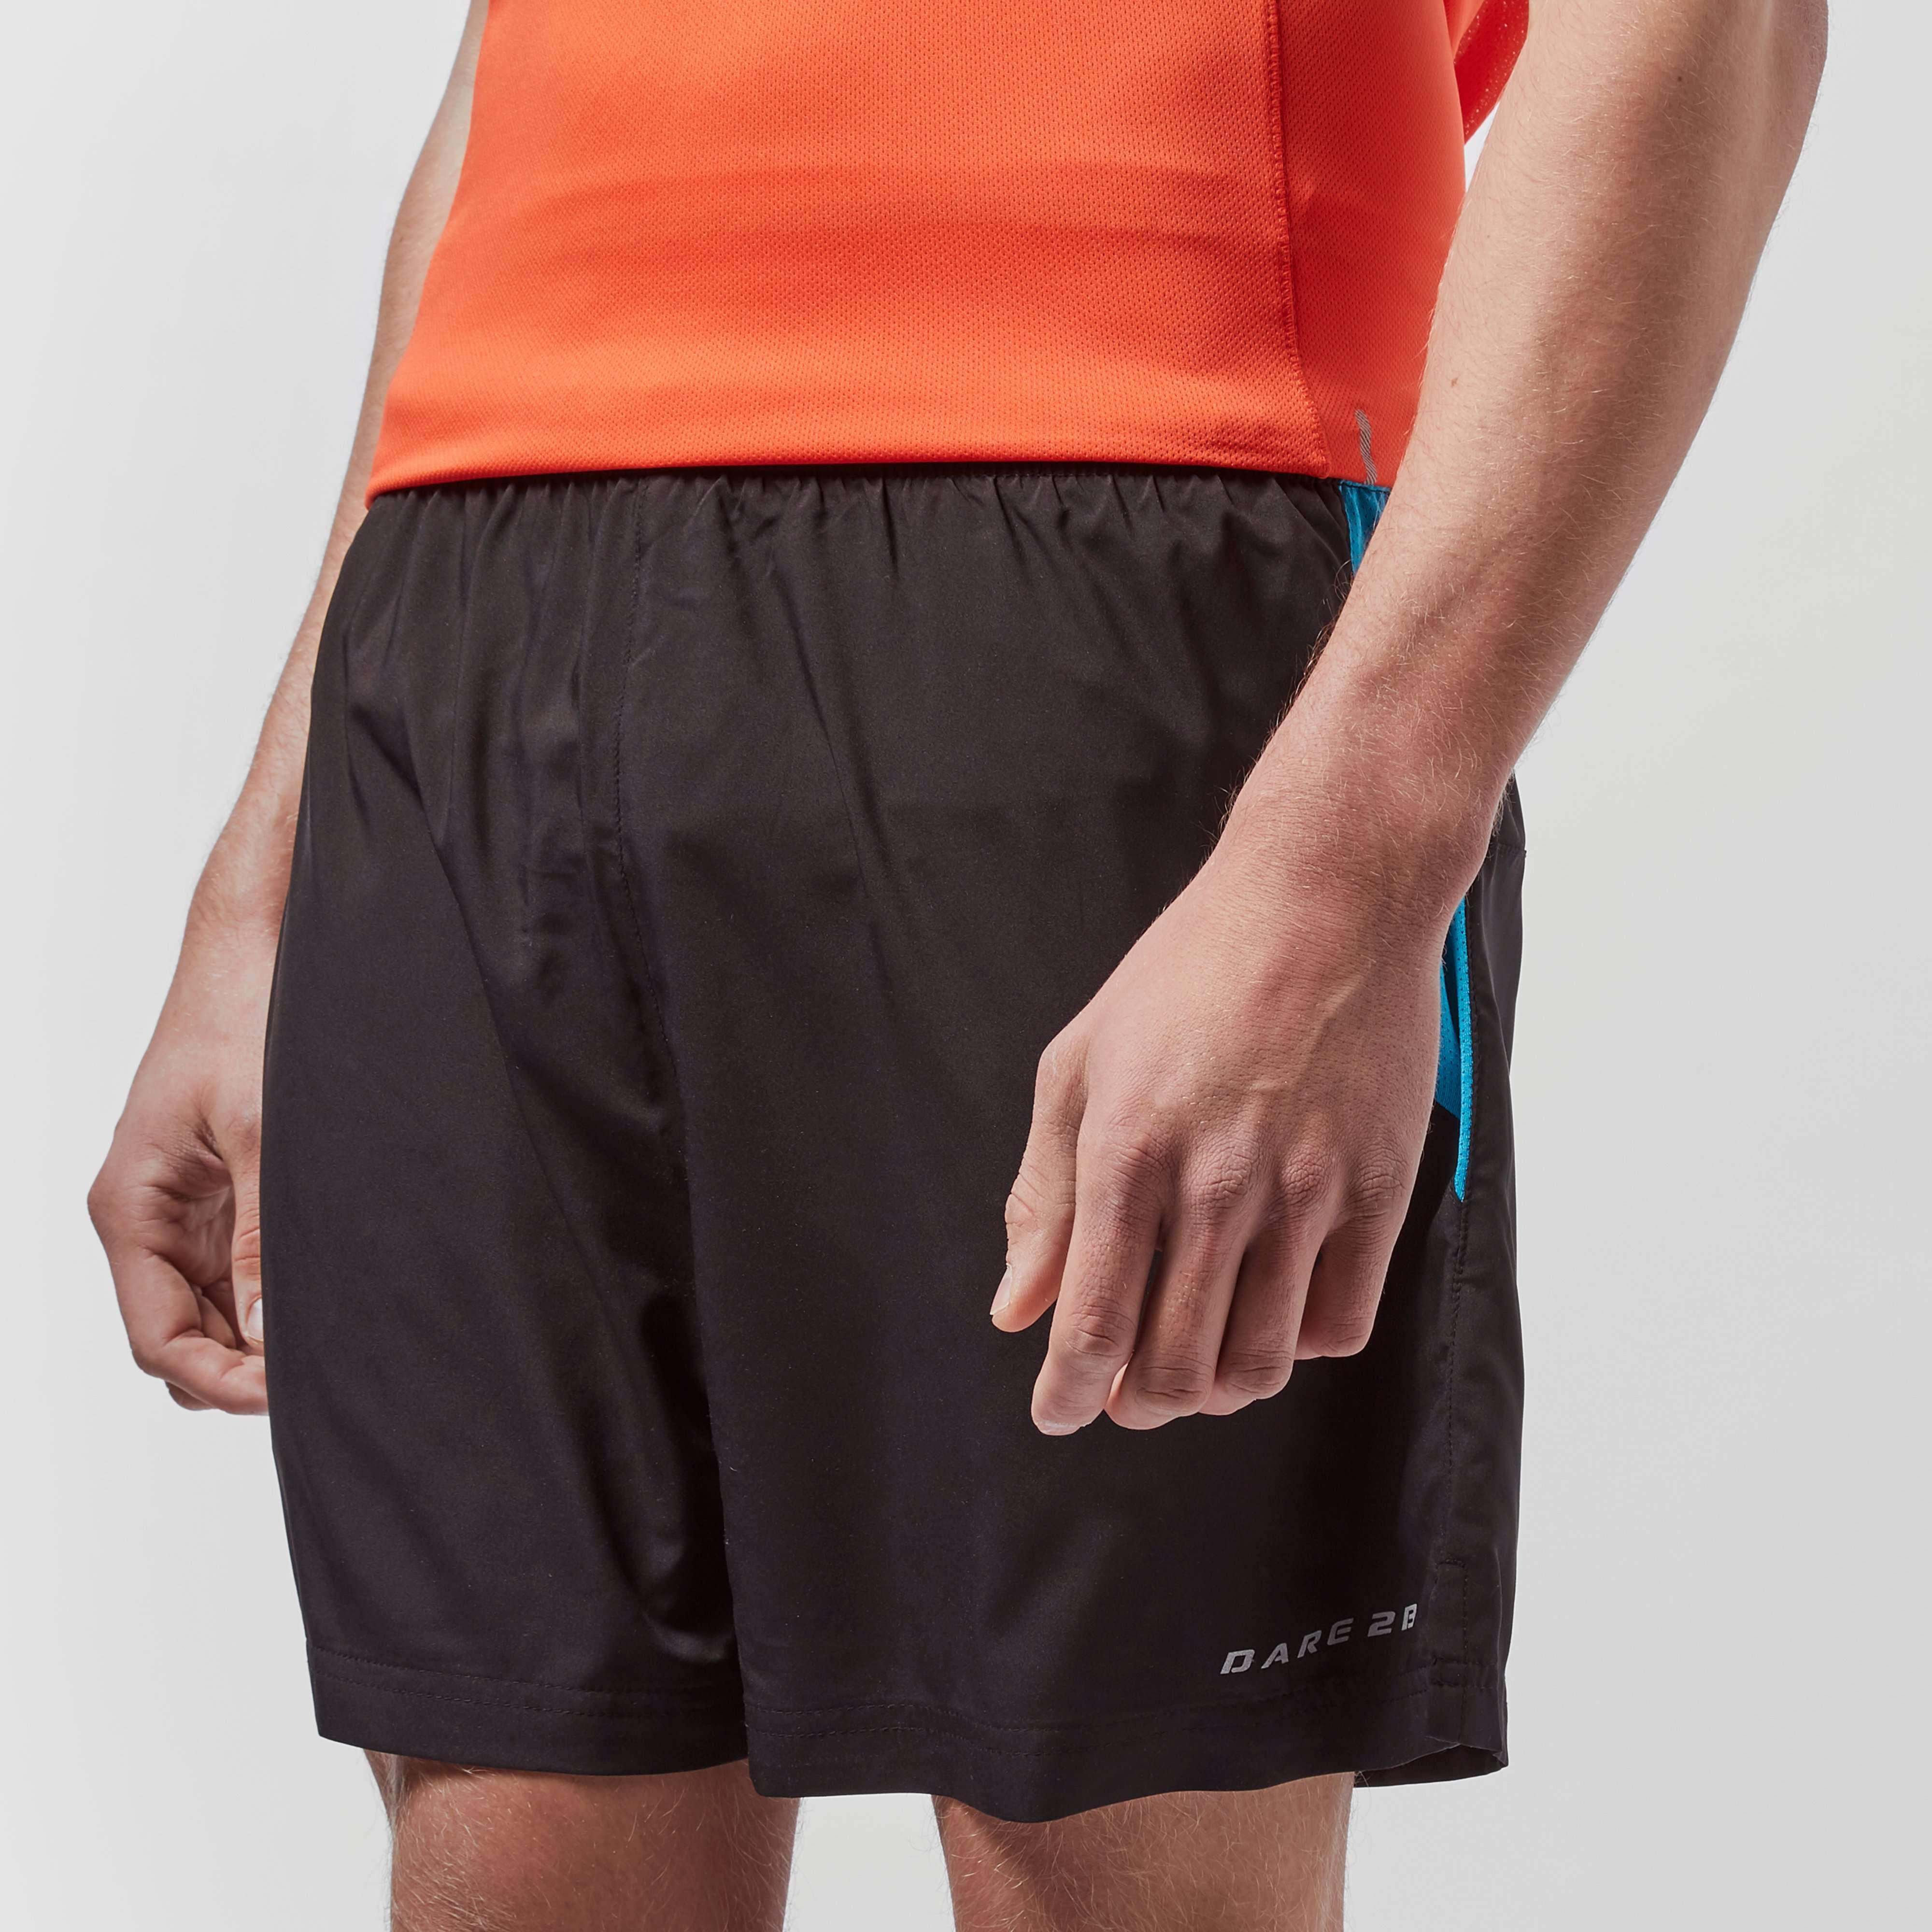 DARE 2B Men's Undulate Shorts